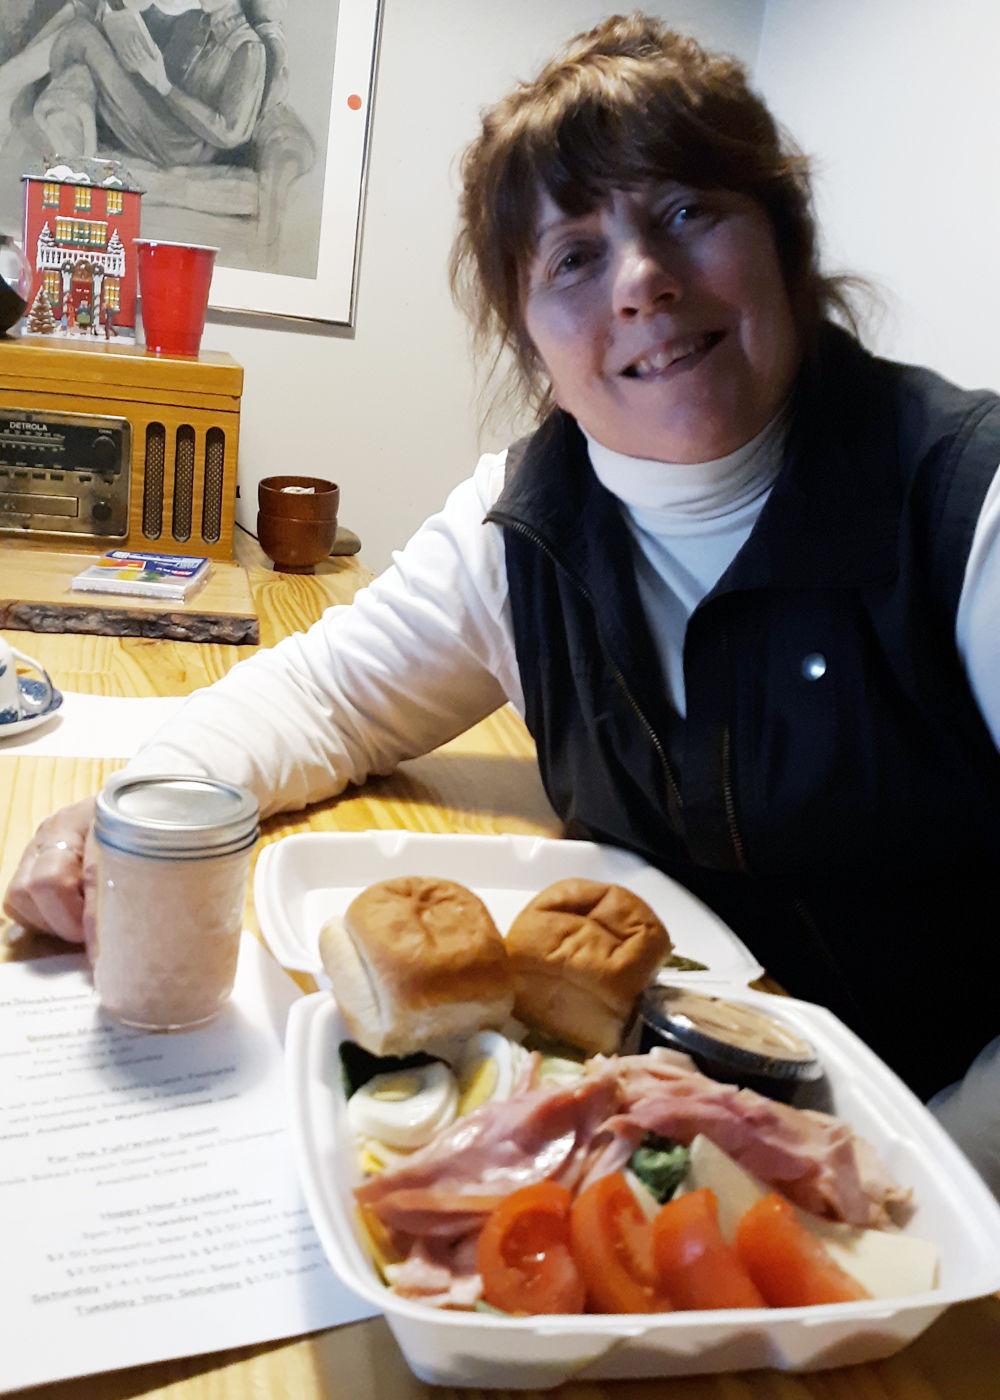 Marino's, Myers get food-service creative during COVID-19 shutdown Wendy